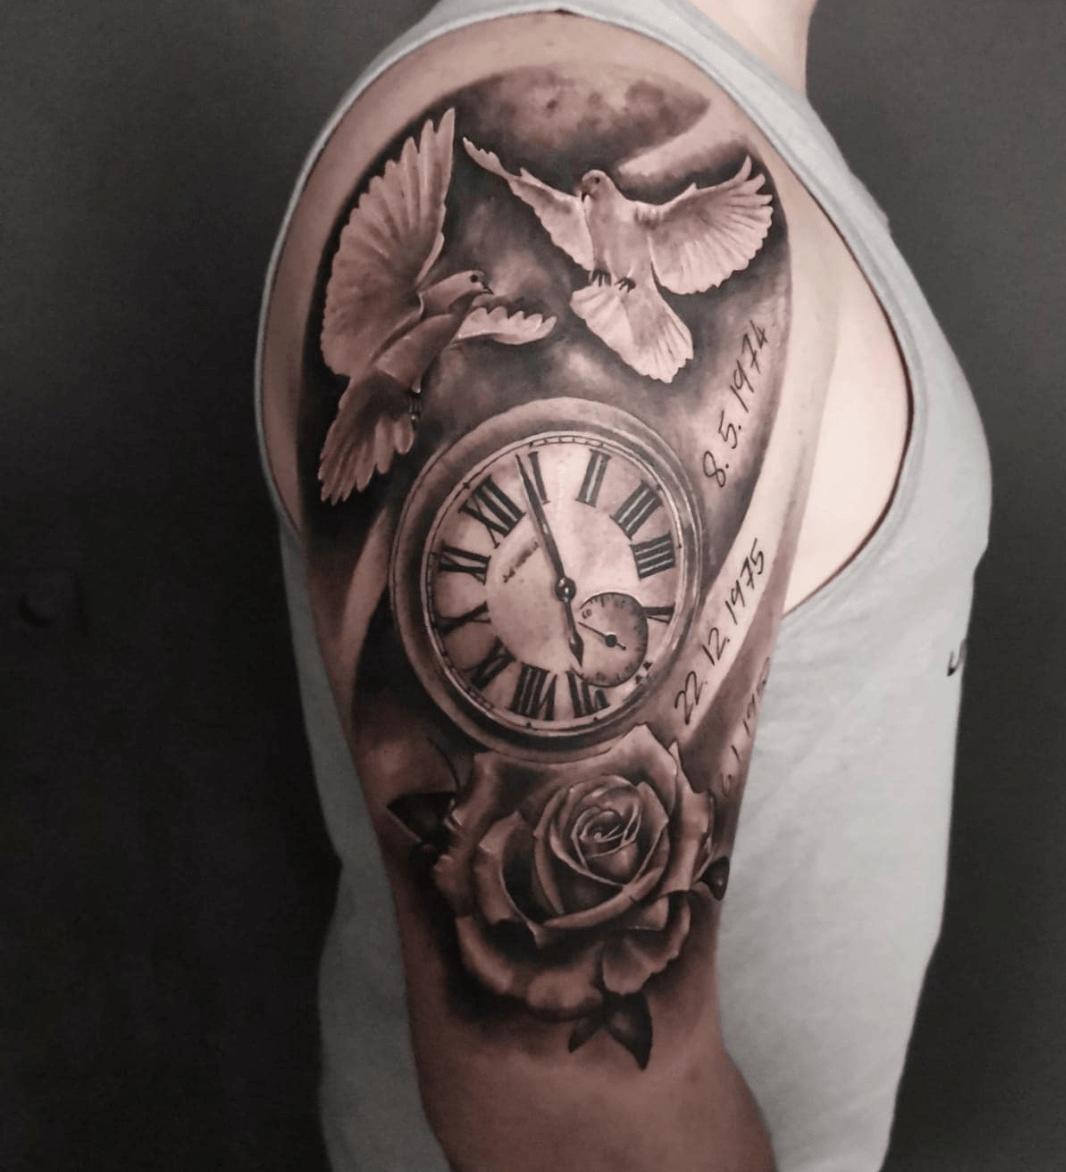 Cosmin Tattoo Work by RoyalPain Essen